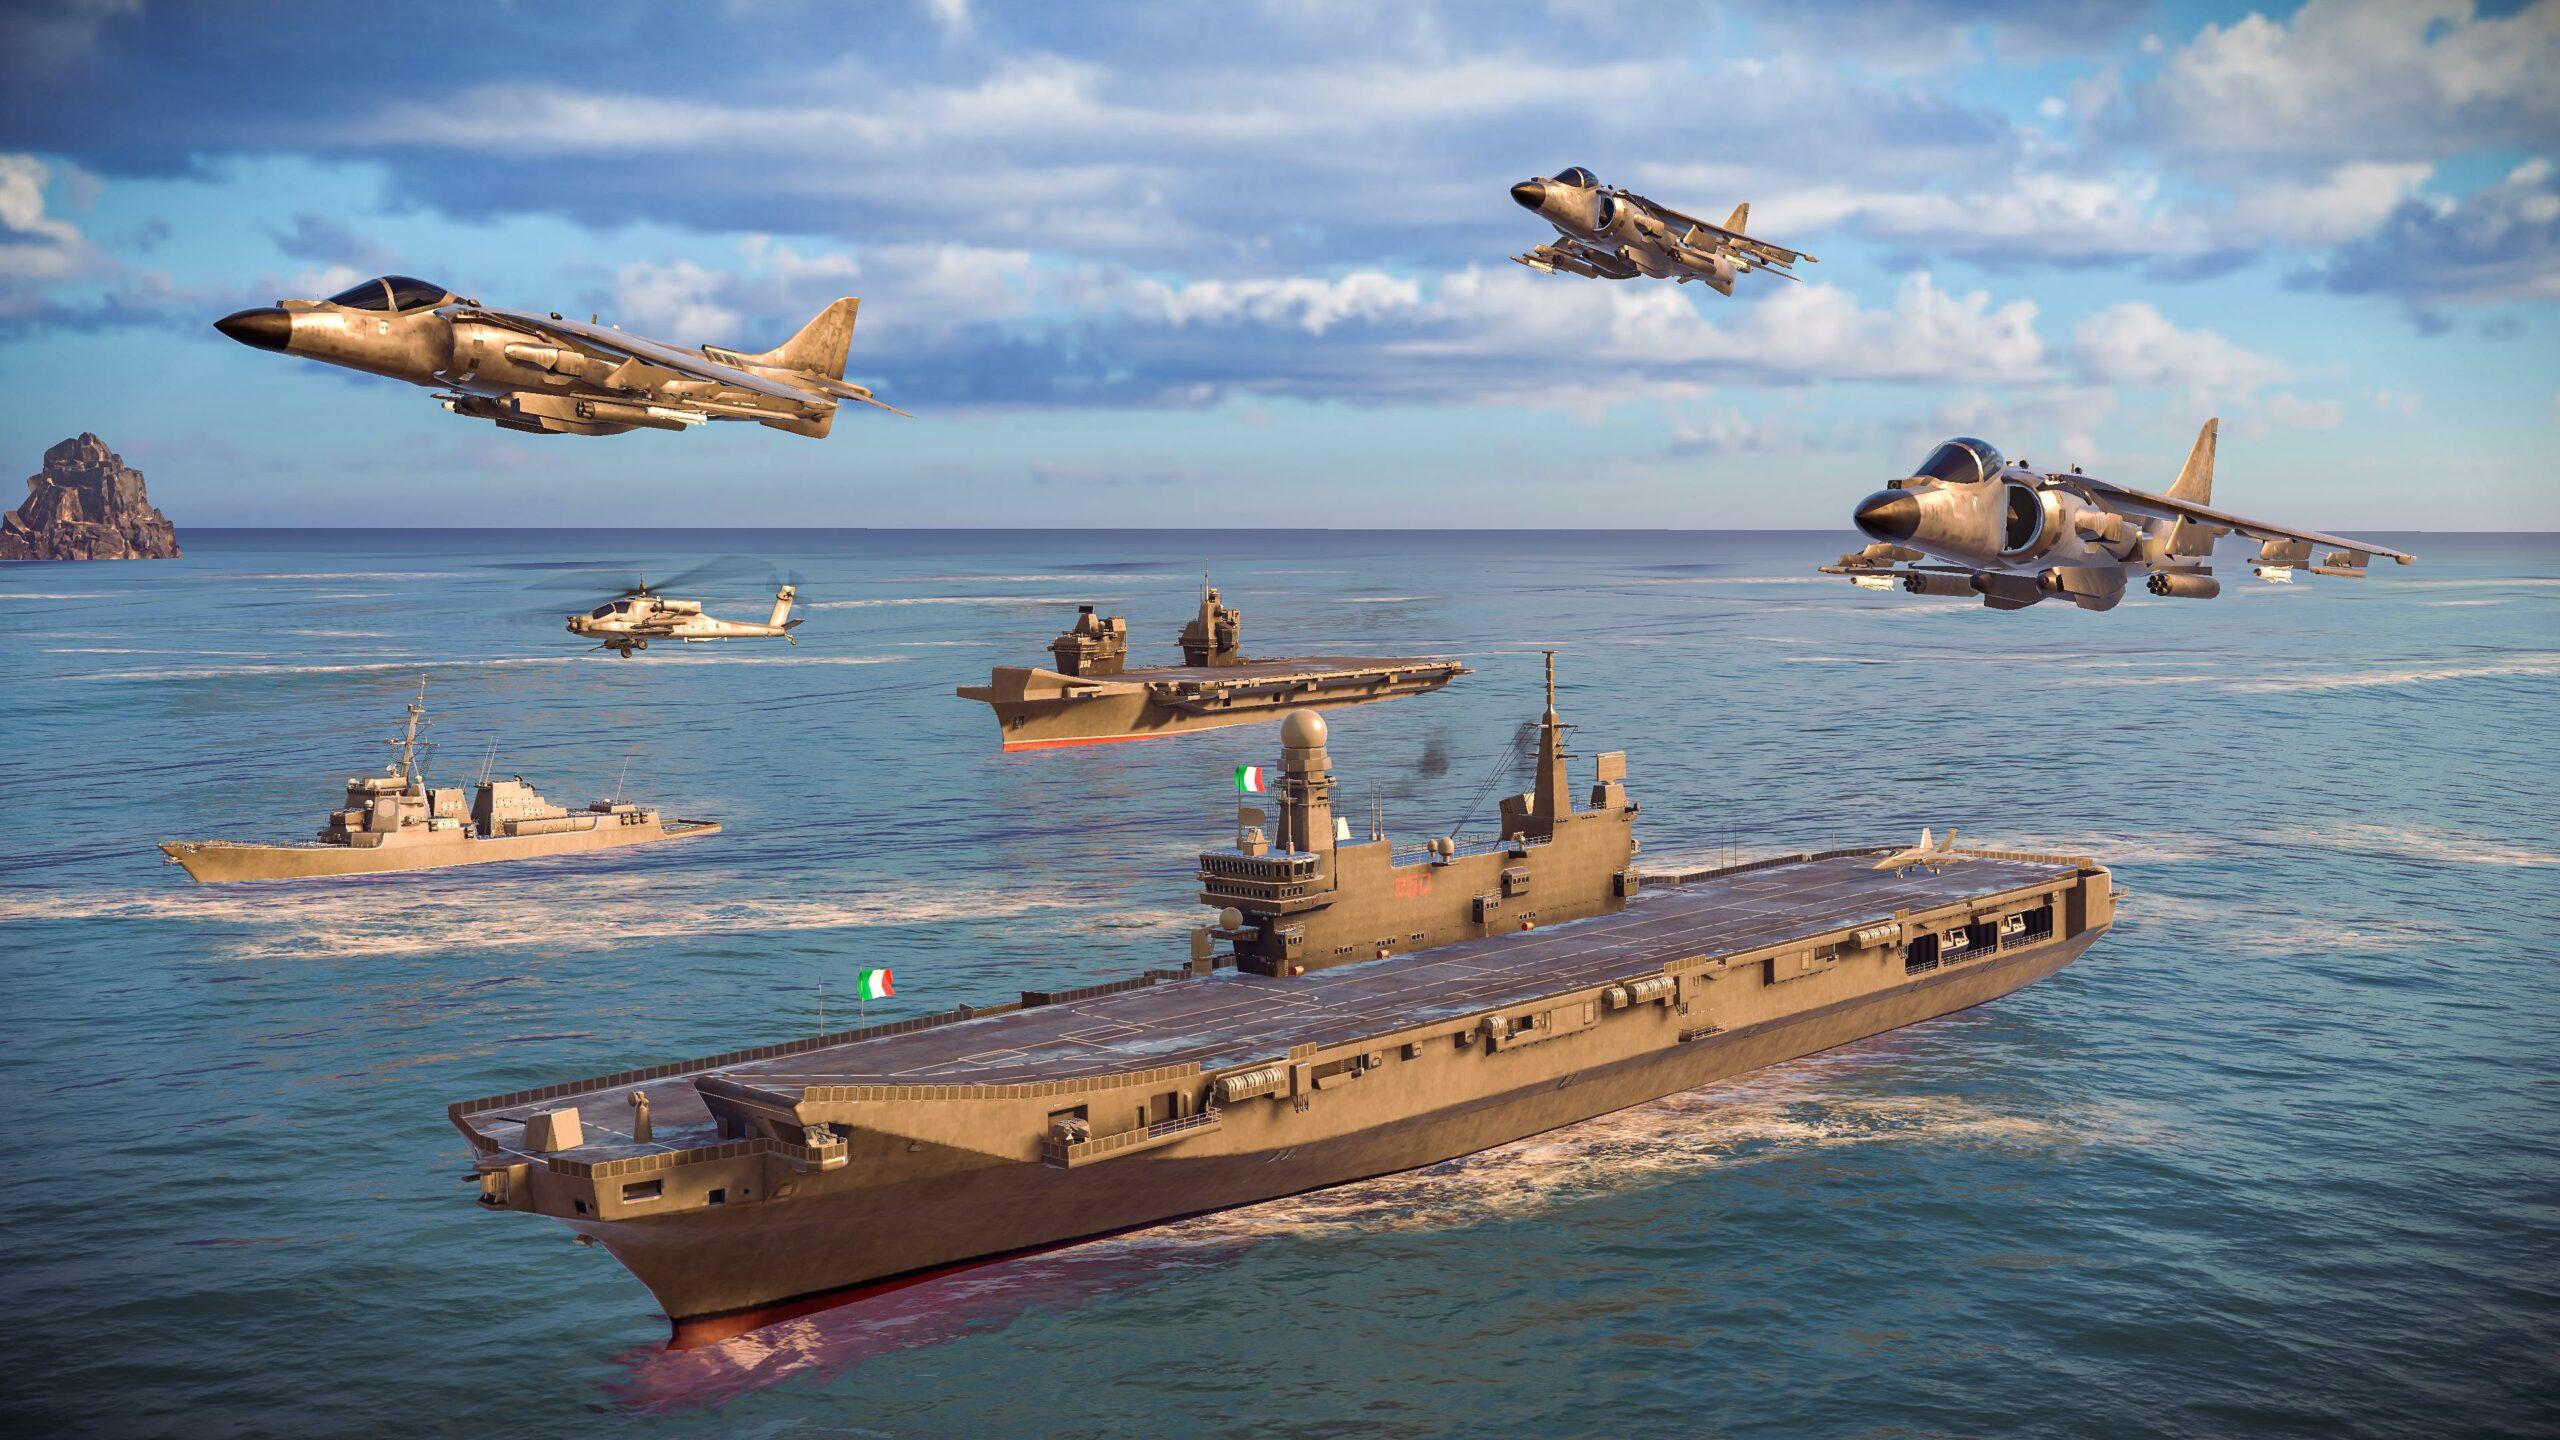 Kemampuan-Tempur-pada-Armada-Terbaik-di-Dunia